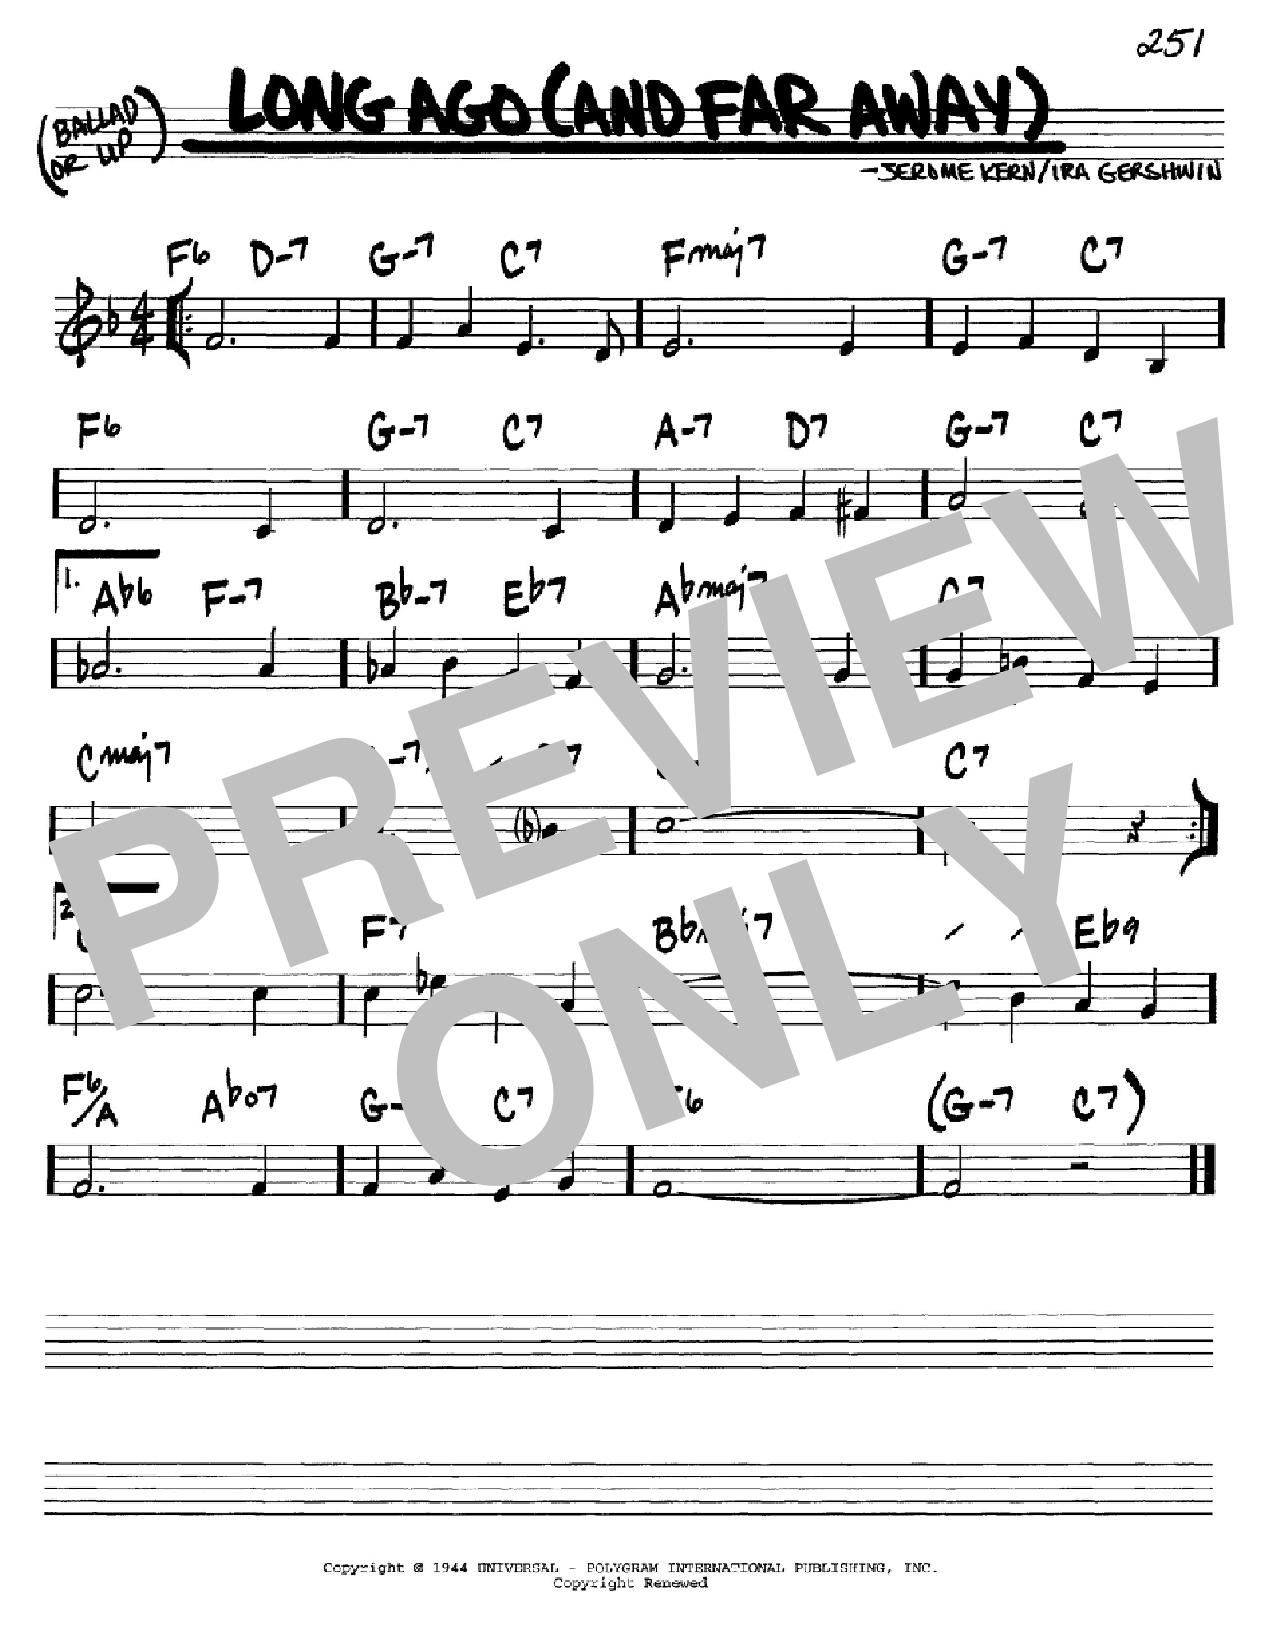 Partition autre Long Ago (And Far Away) de Jerome Kern - Real Book, Melodie et Accords, Inst. En Do